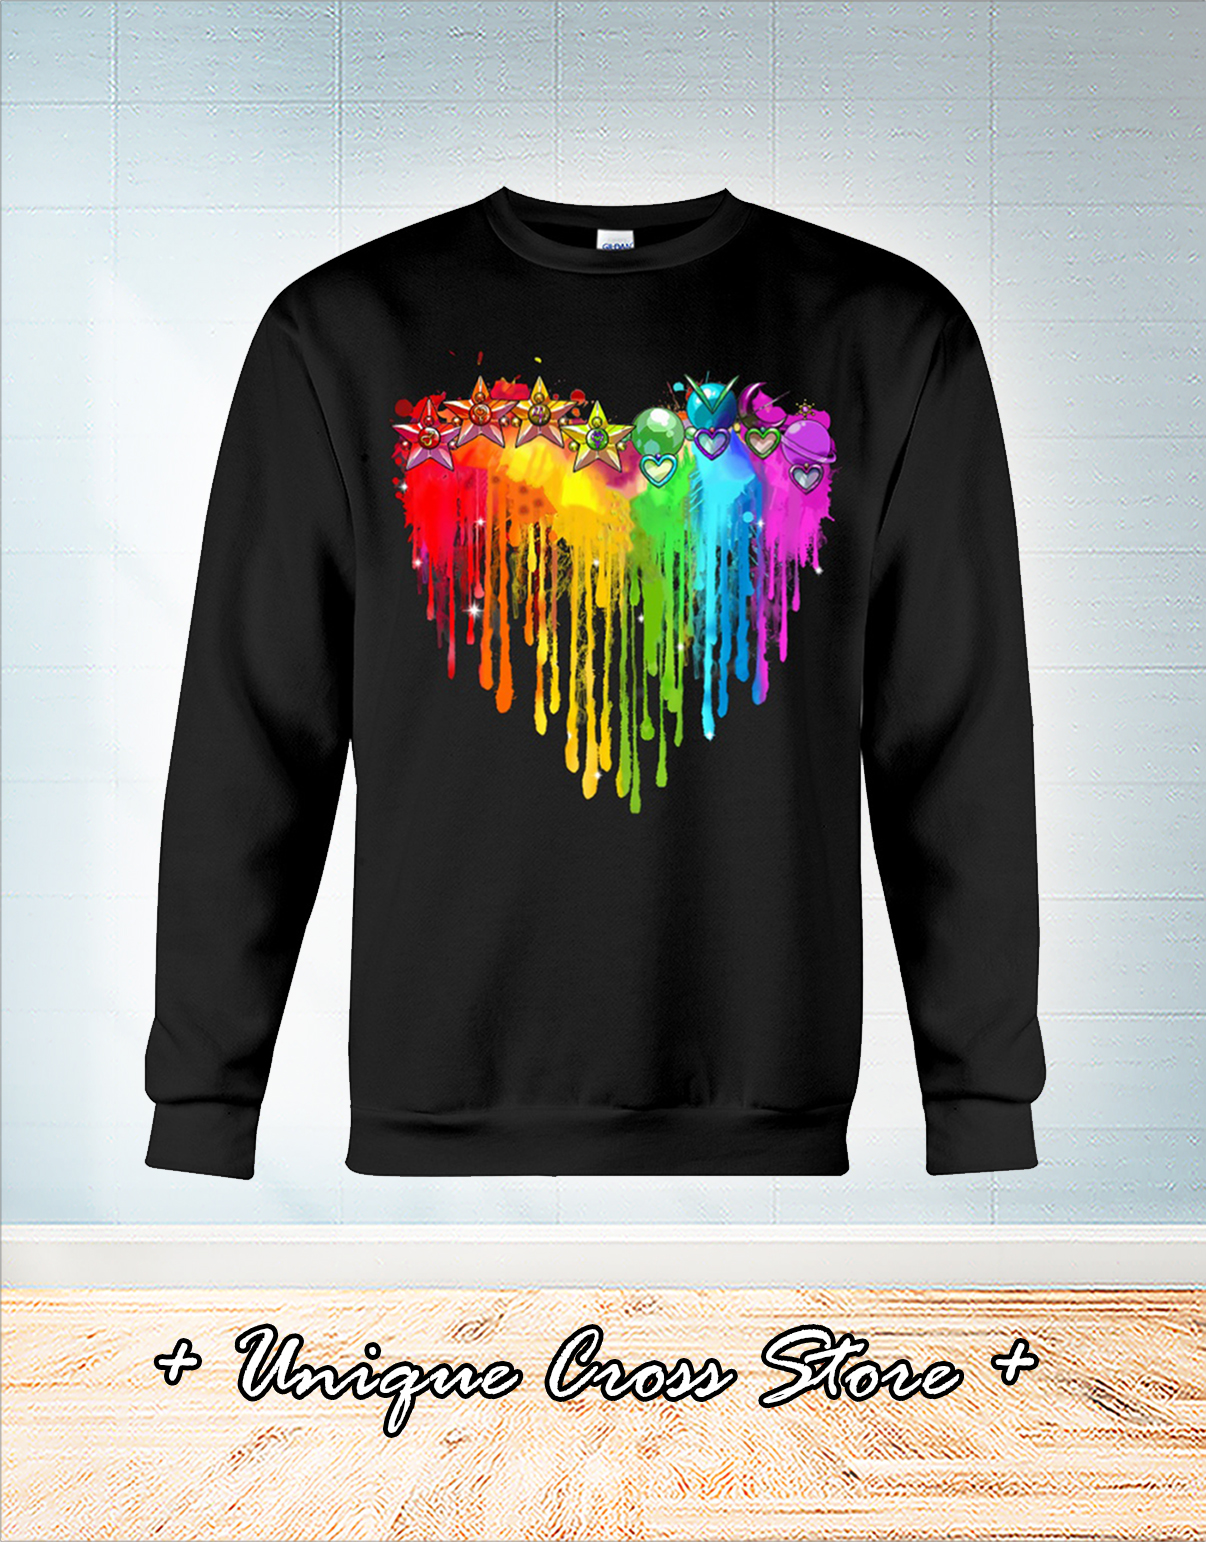 Rb sailor heart color shirt